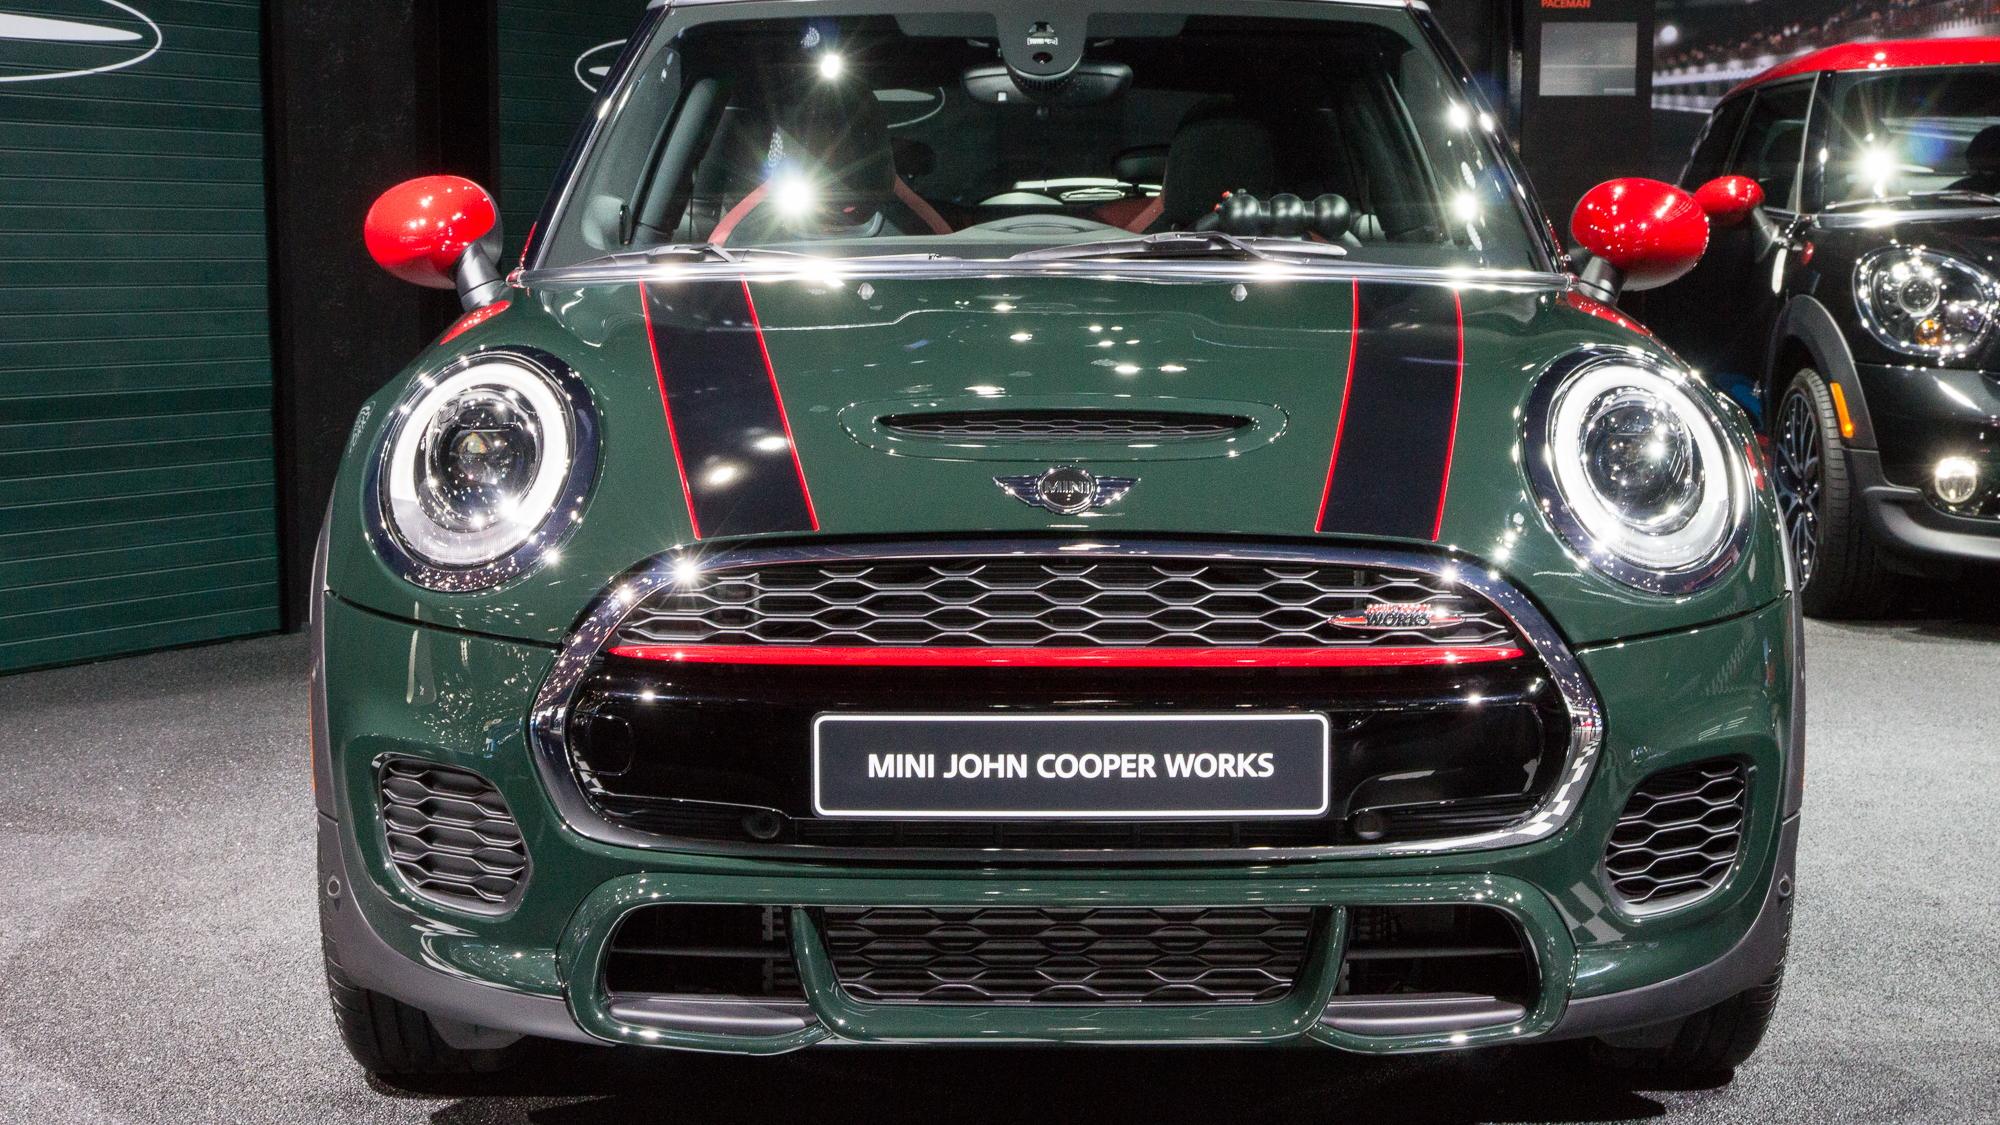 2015 MINI John Cooper Works Hardtop live photos, 2015 Detroit Auto Show